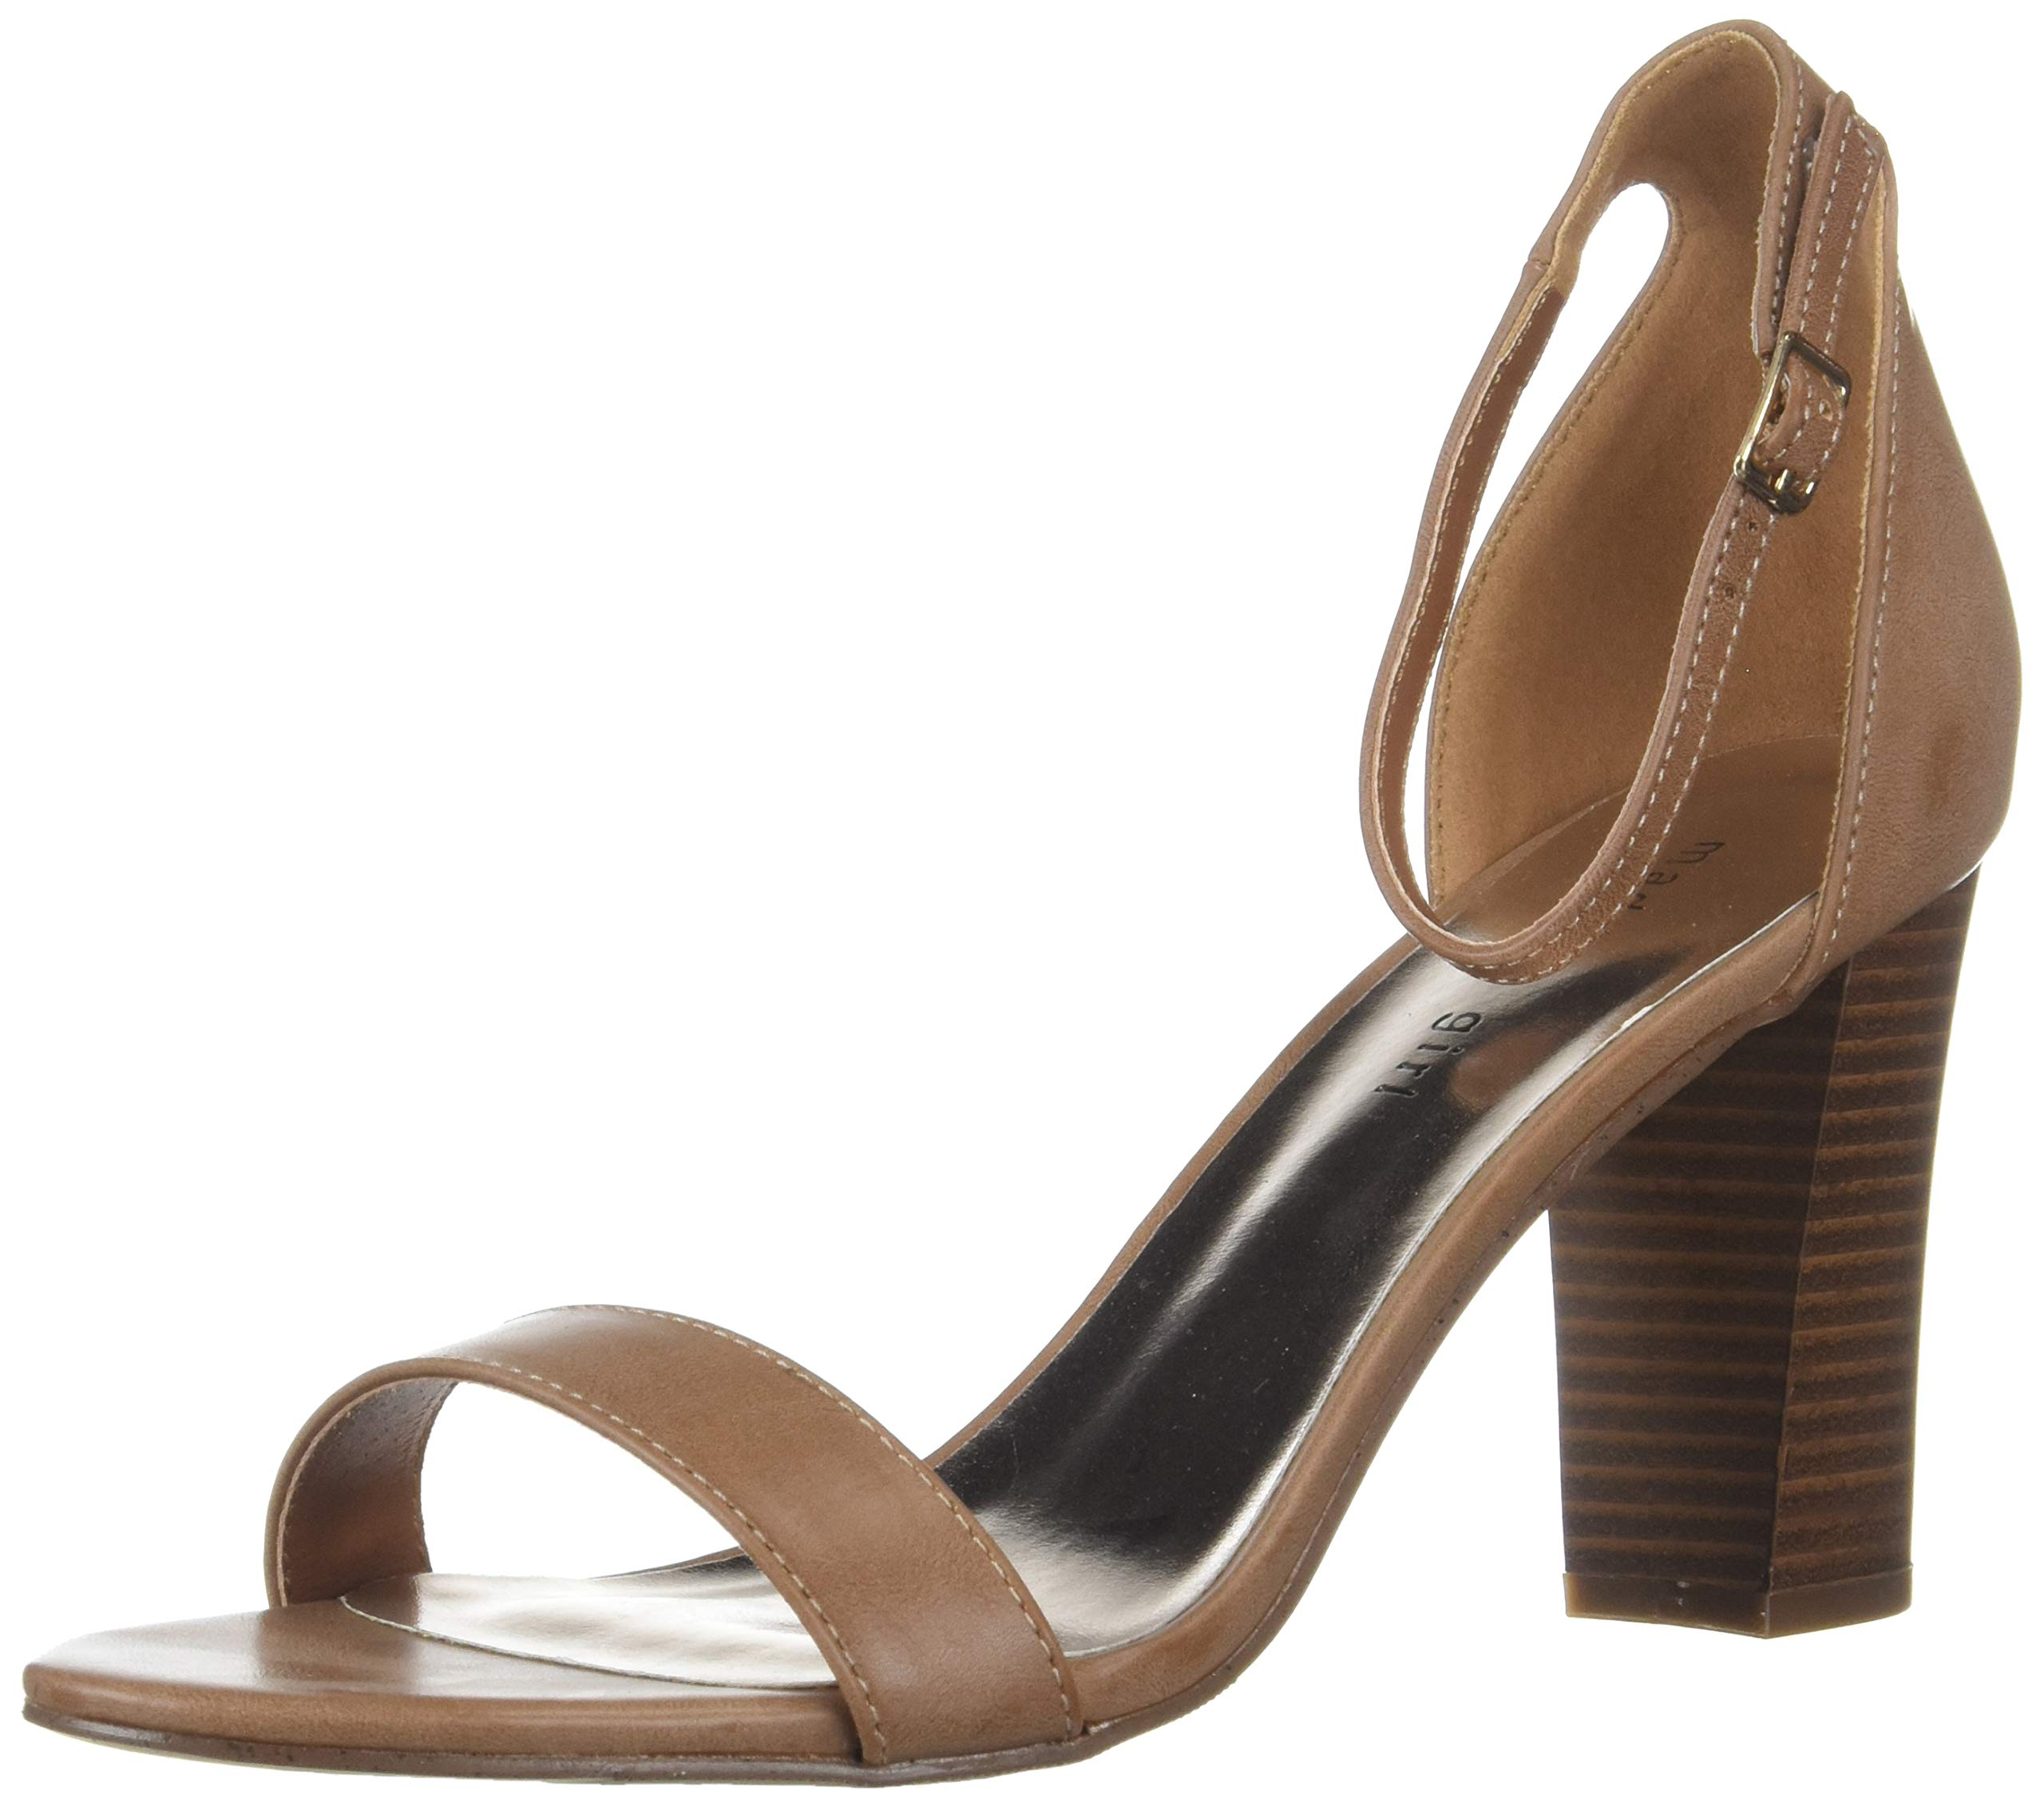 ec90ce9dbb1 Galleon - Madden Girl Women s BEELLA Heeled Sandal